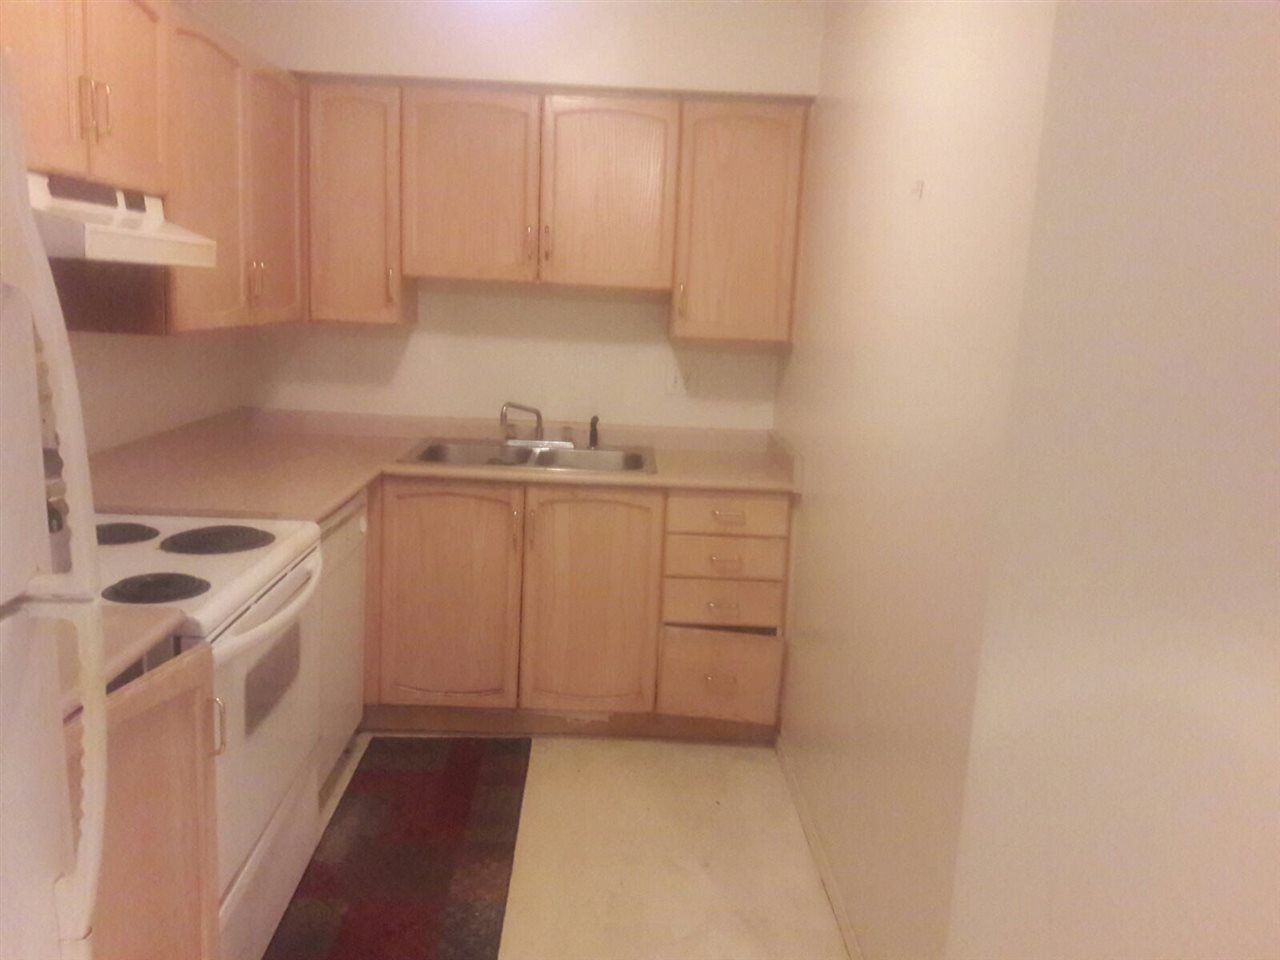 Condo Apartment at 113 2962 TRETHEWEY STREET, Unit 113, Abbotsford, British Columbia. Image 2